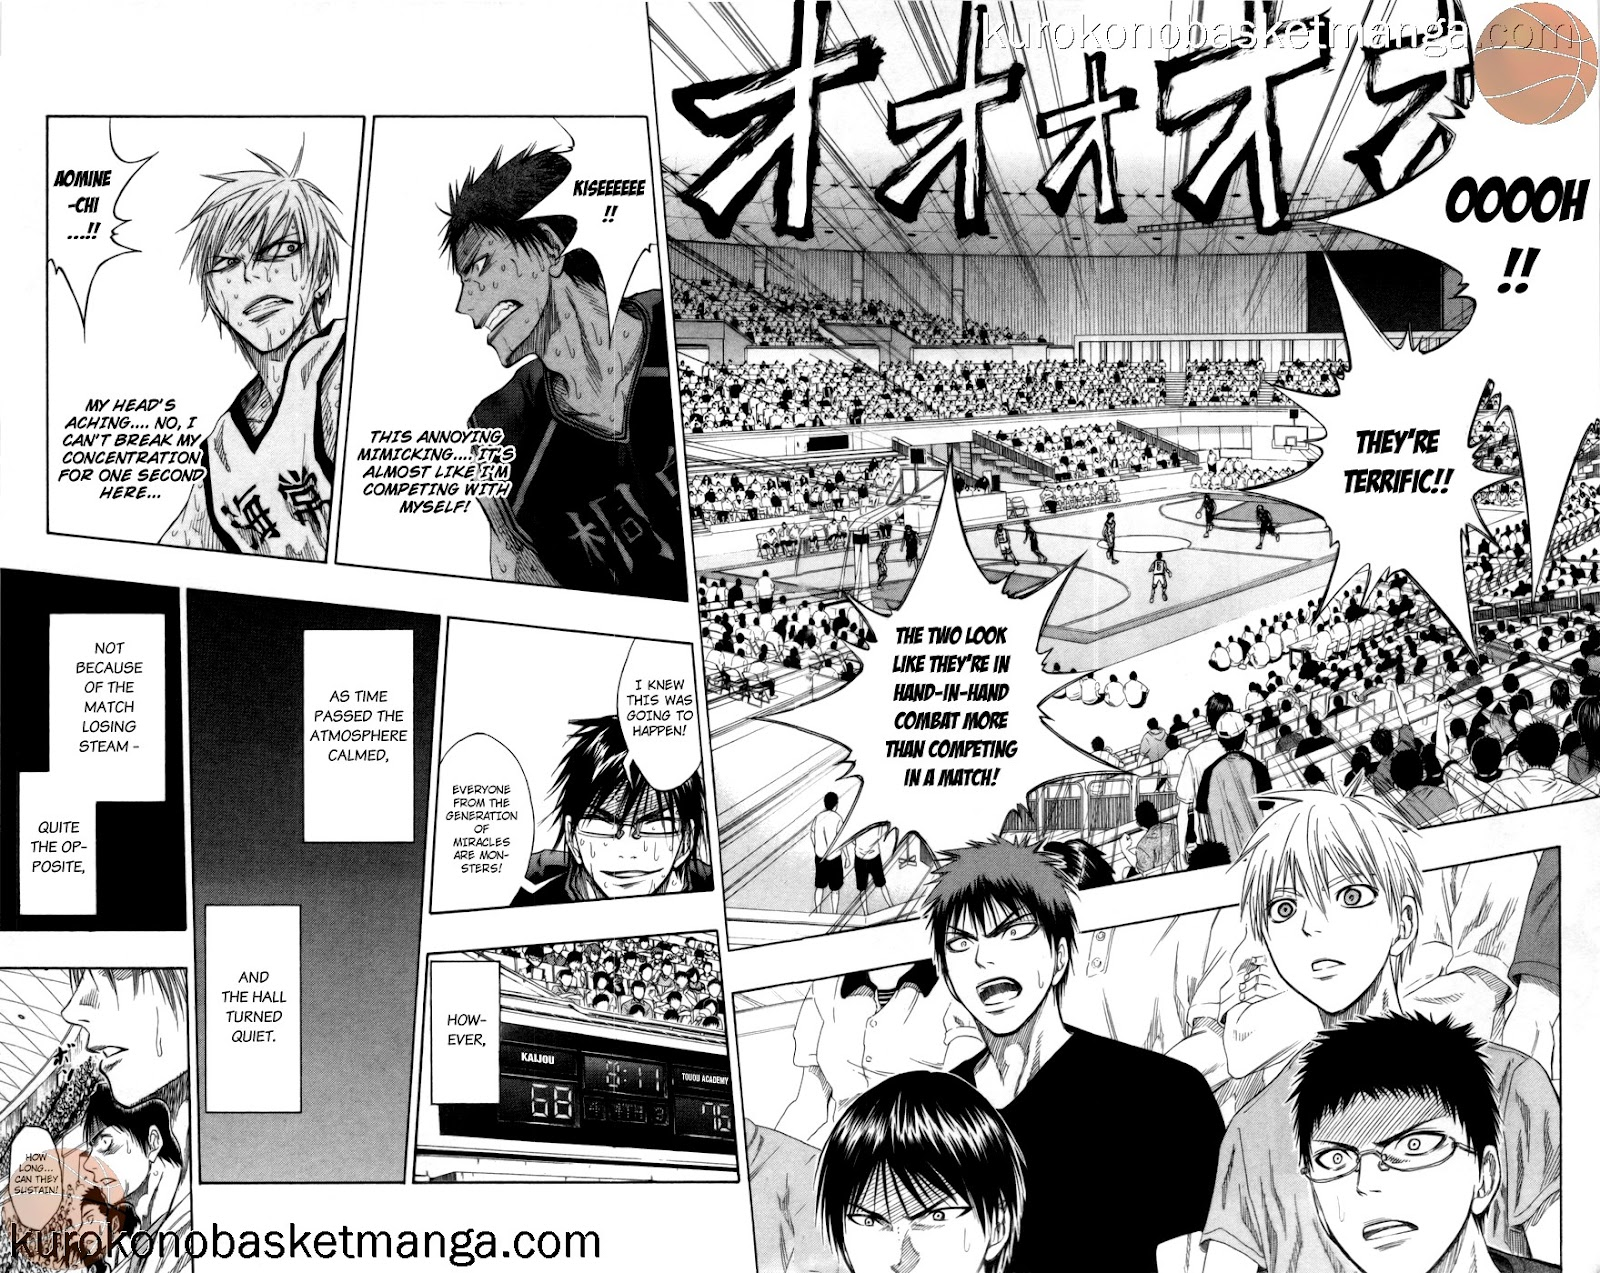 Kuroko no Basket Manga Chapter 71 - Image 14-14